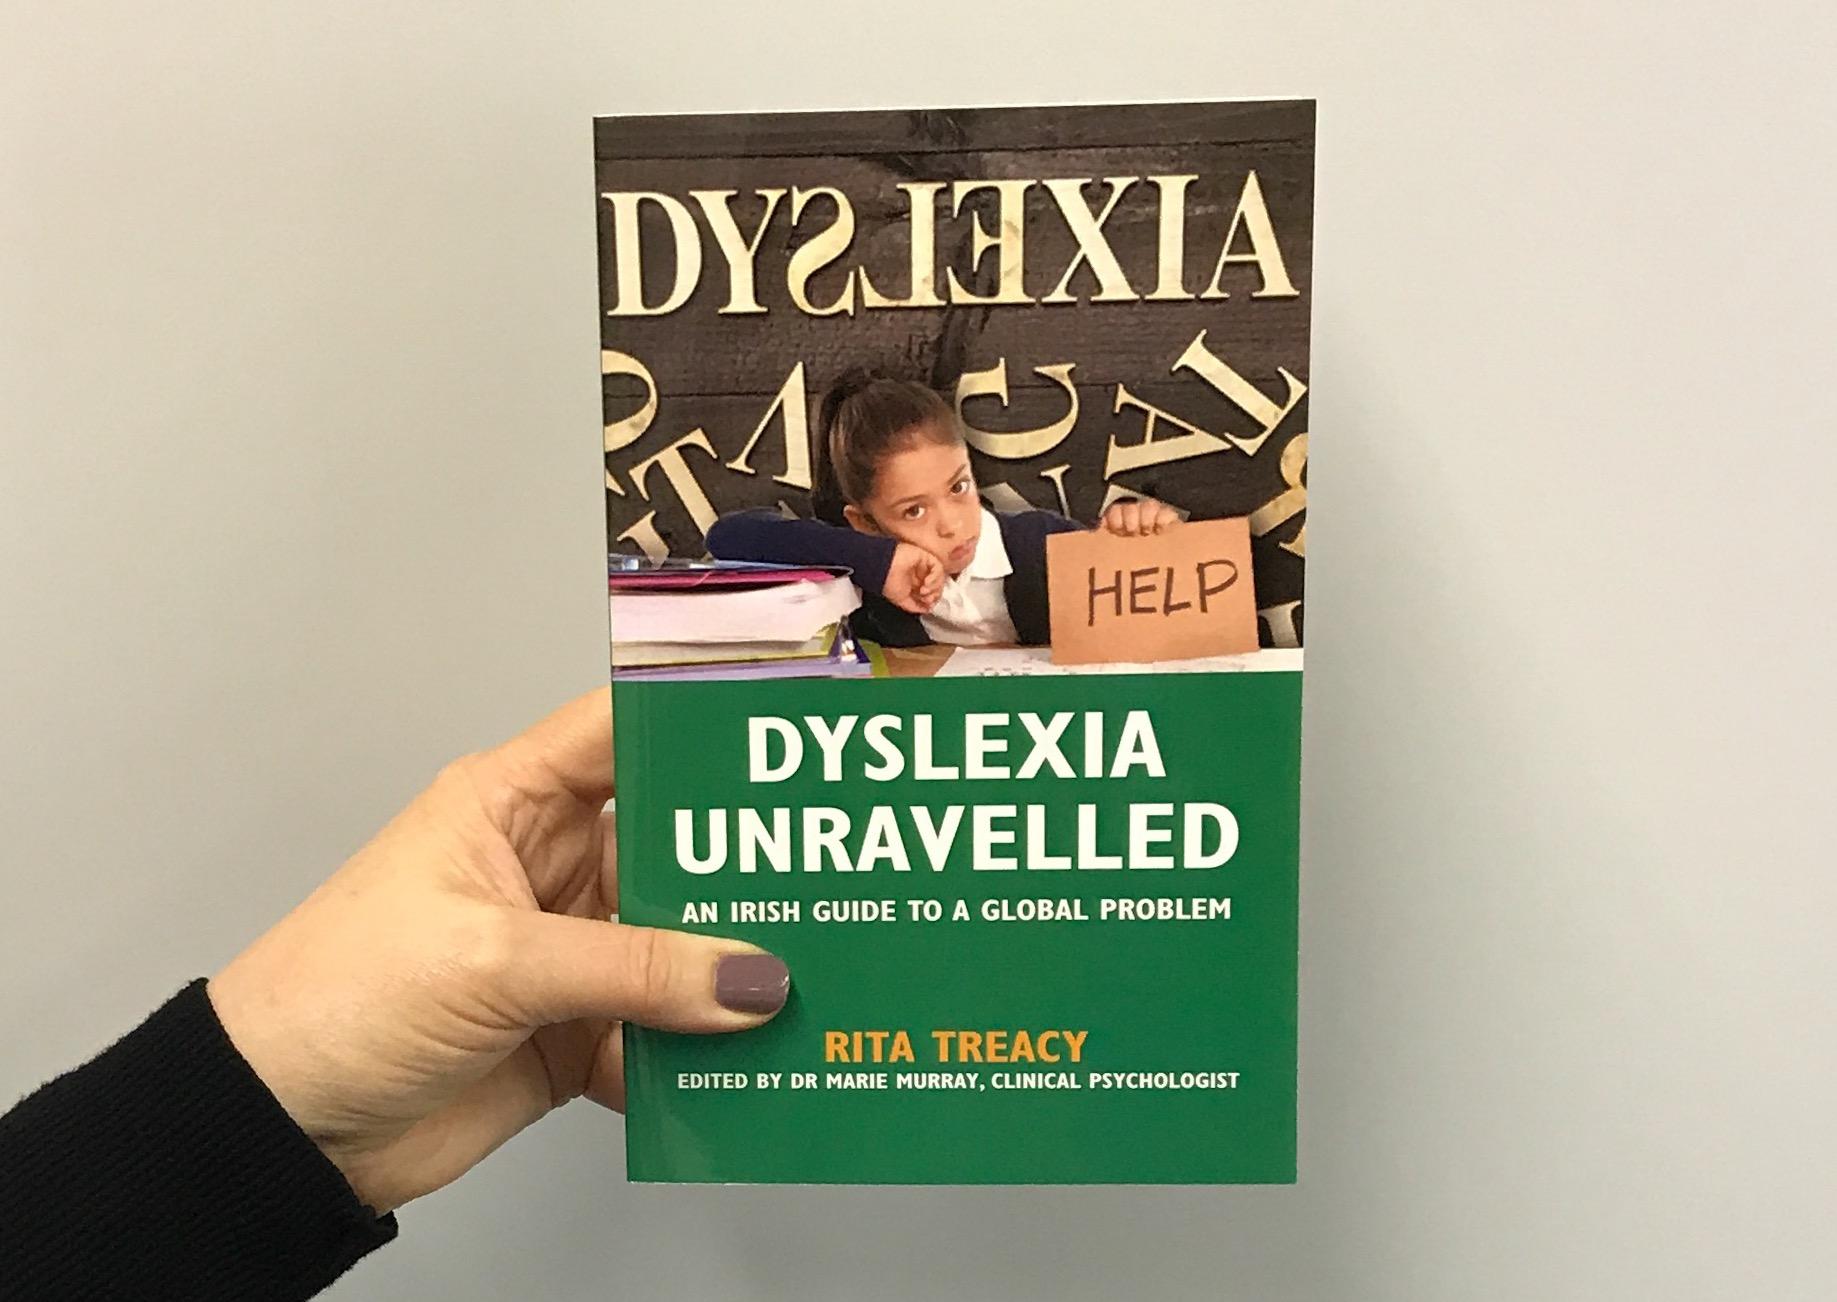 RT Book